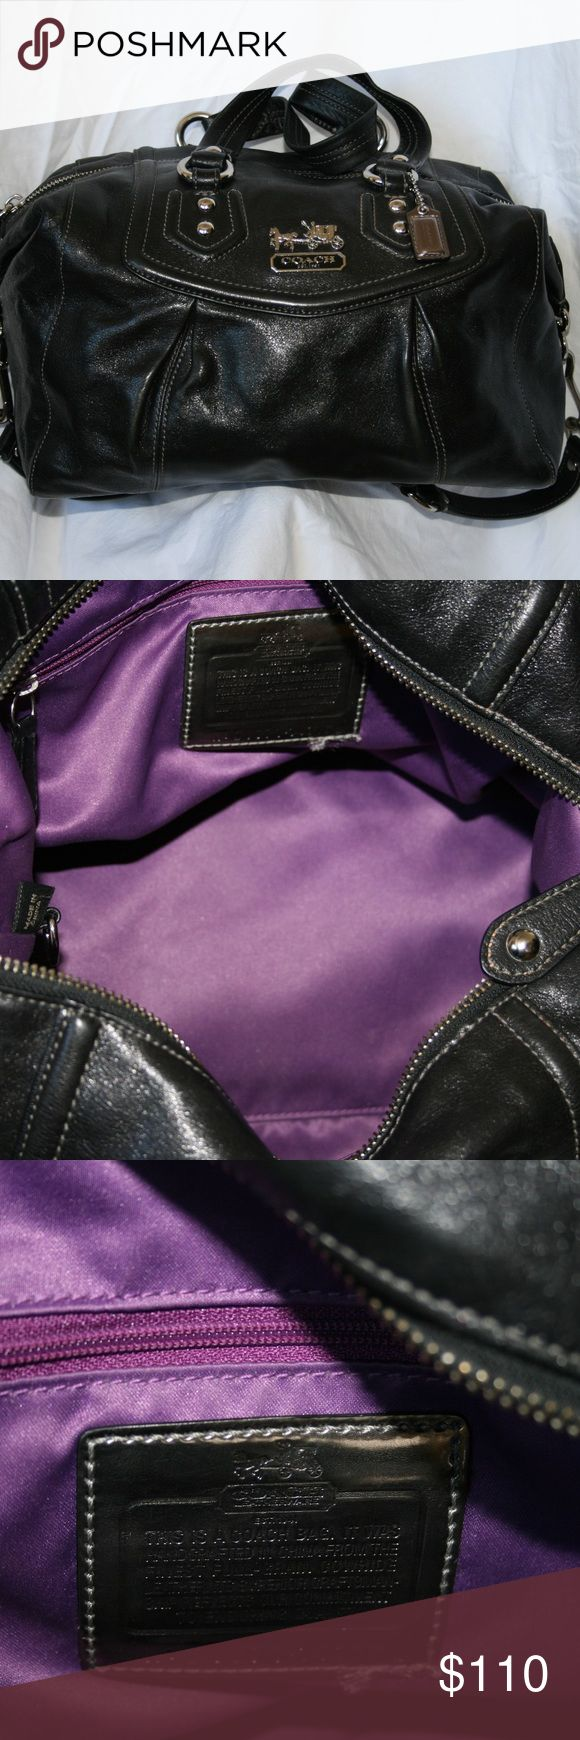 Large Black Leather Sabrina Coach Satchel Coach Black Sabina Satchel Coach Bags Satchels